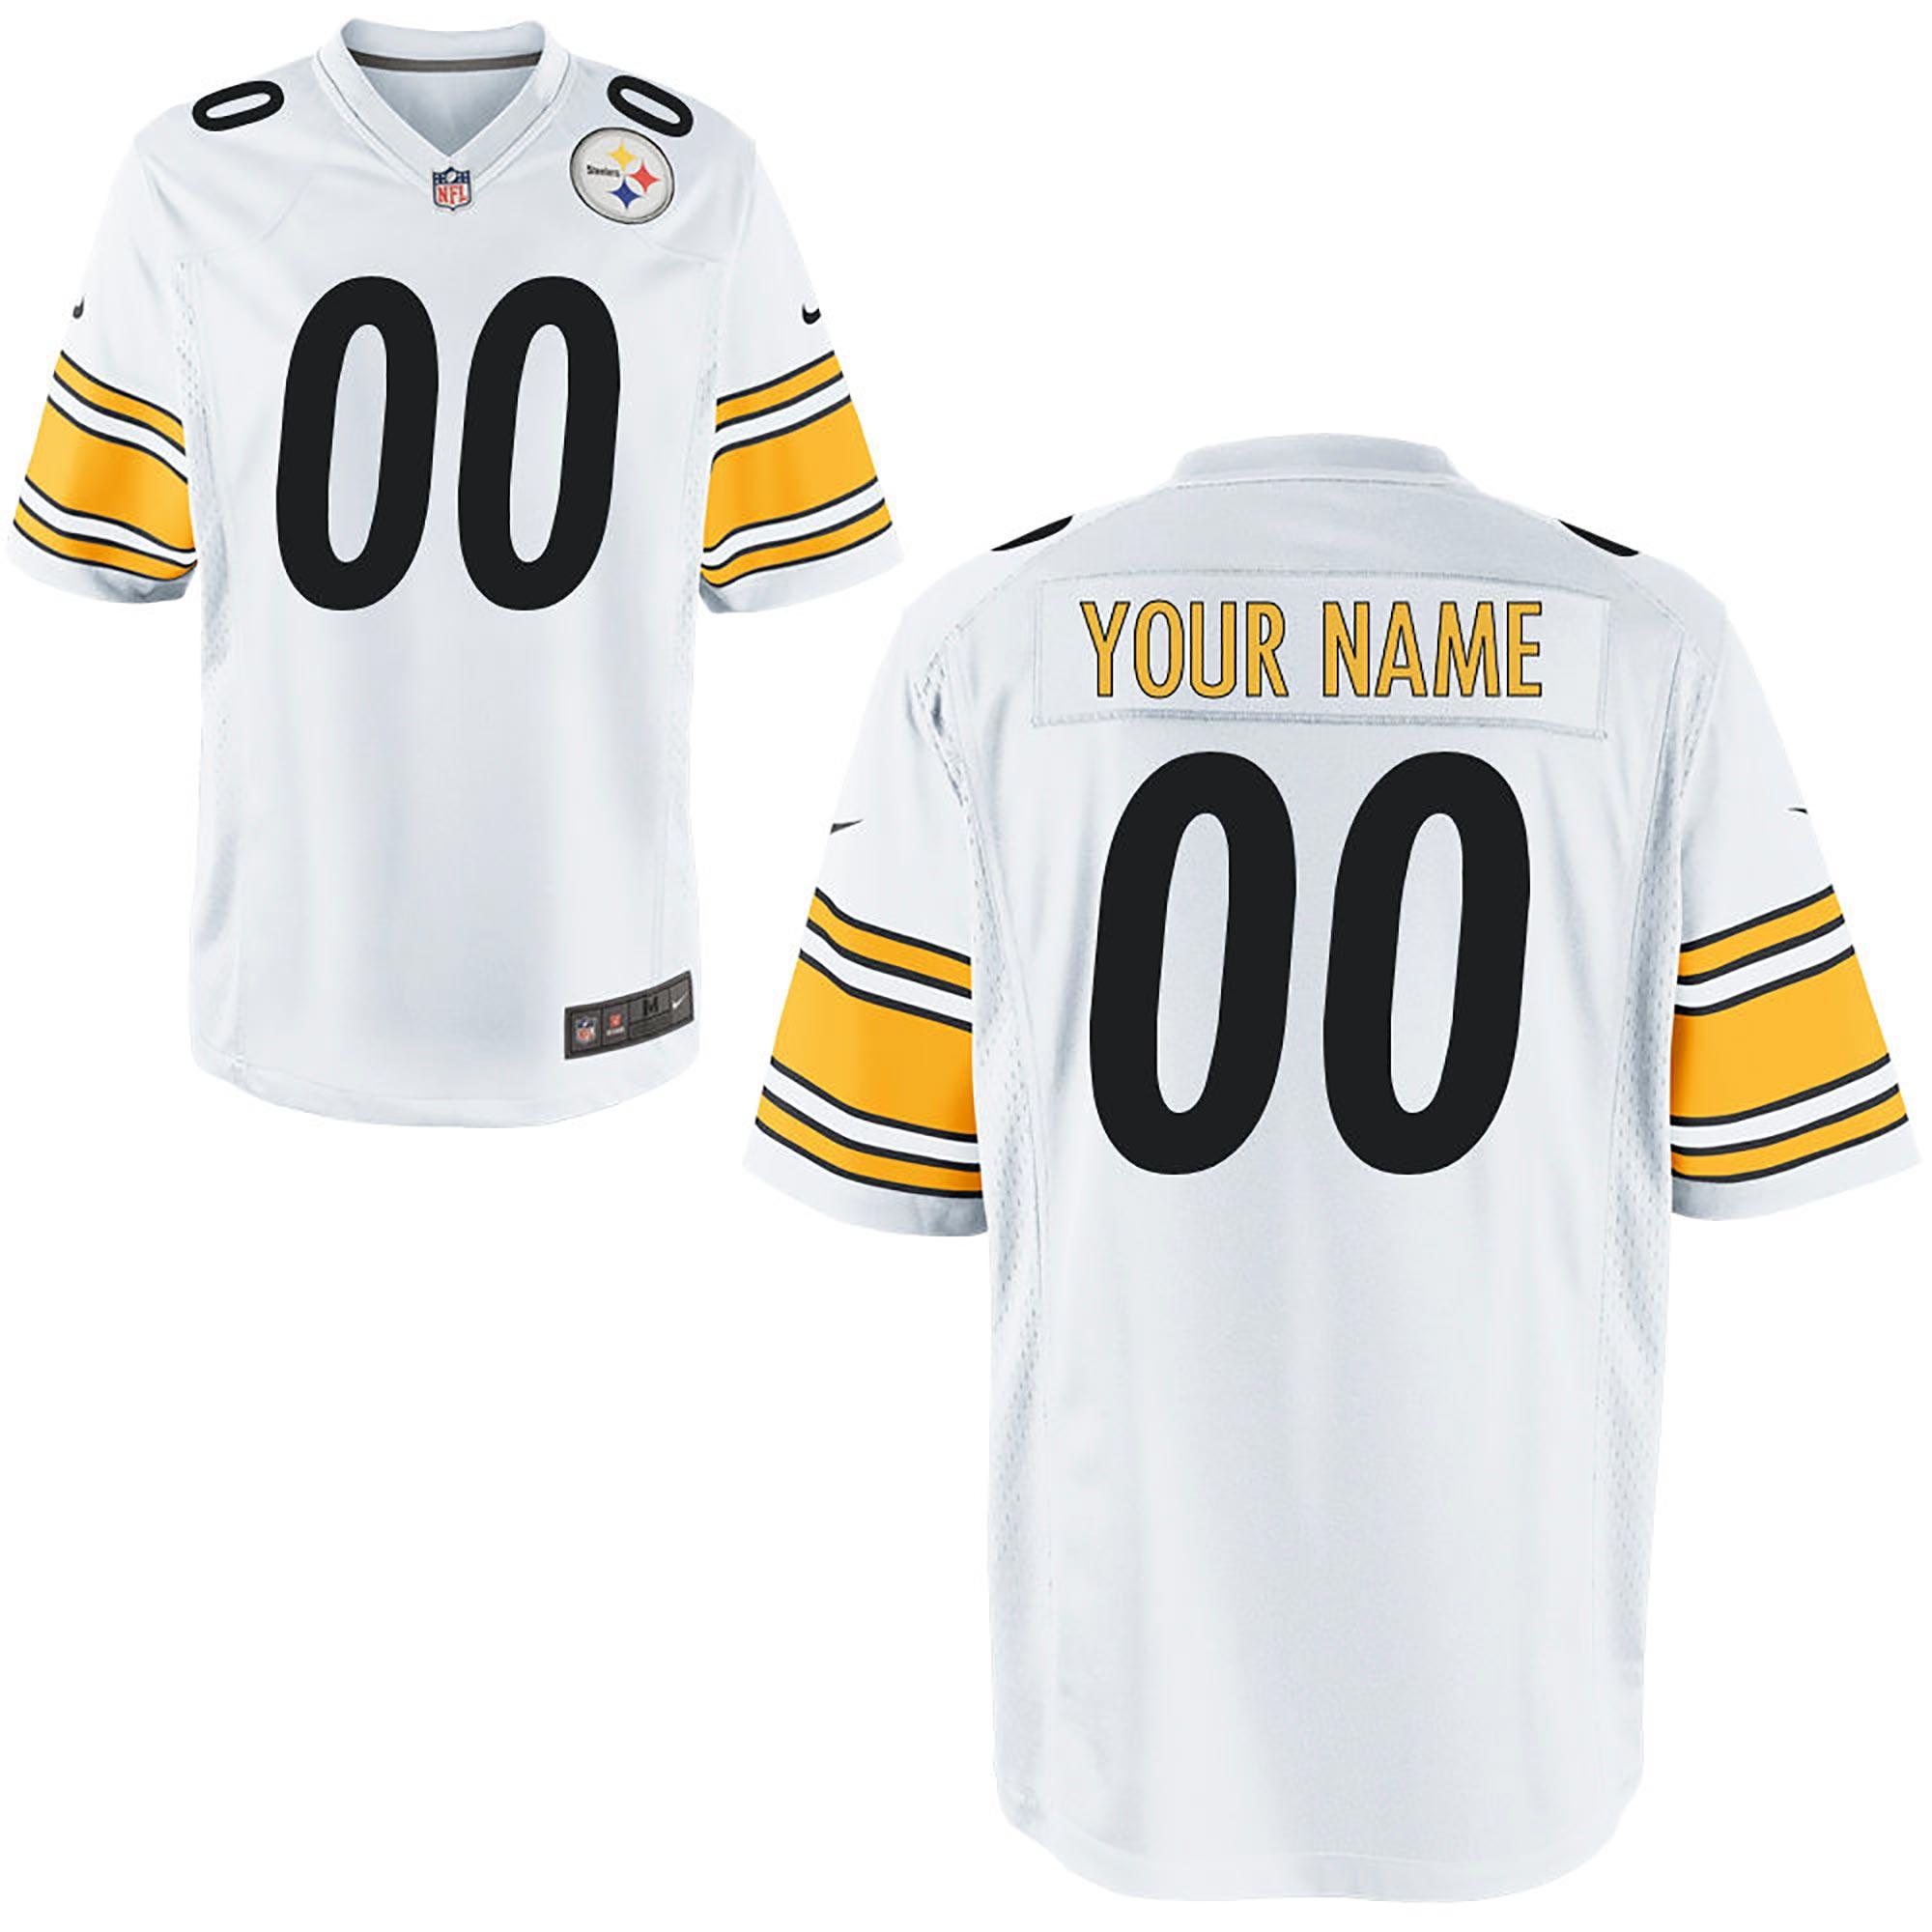 Pittsburgh Steelers Auswärtstrikot – personalisierbar – Herren